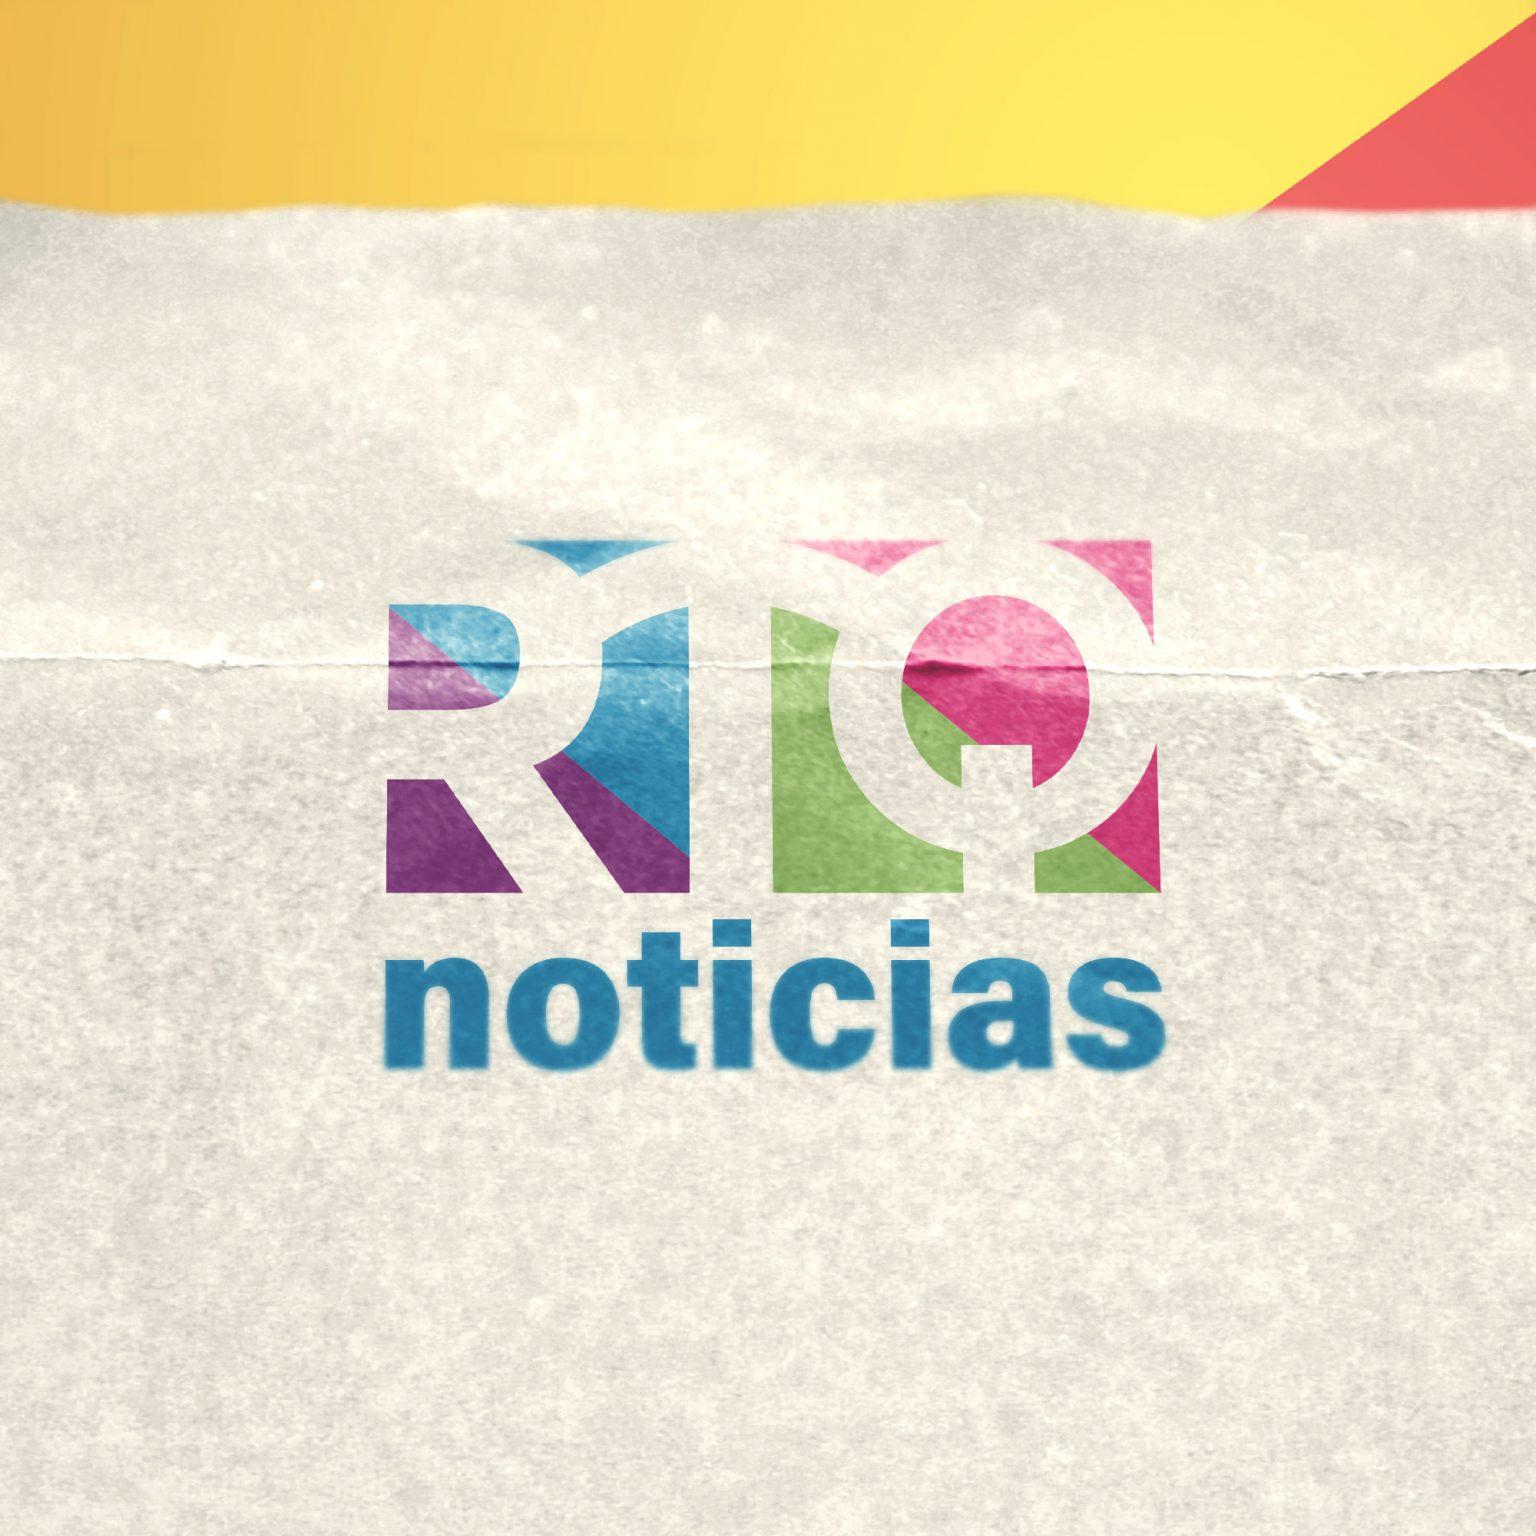 Logotipo RTQ Noticias